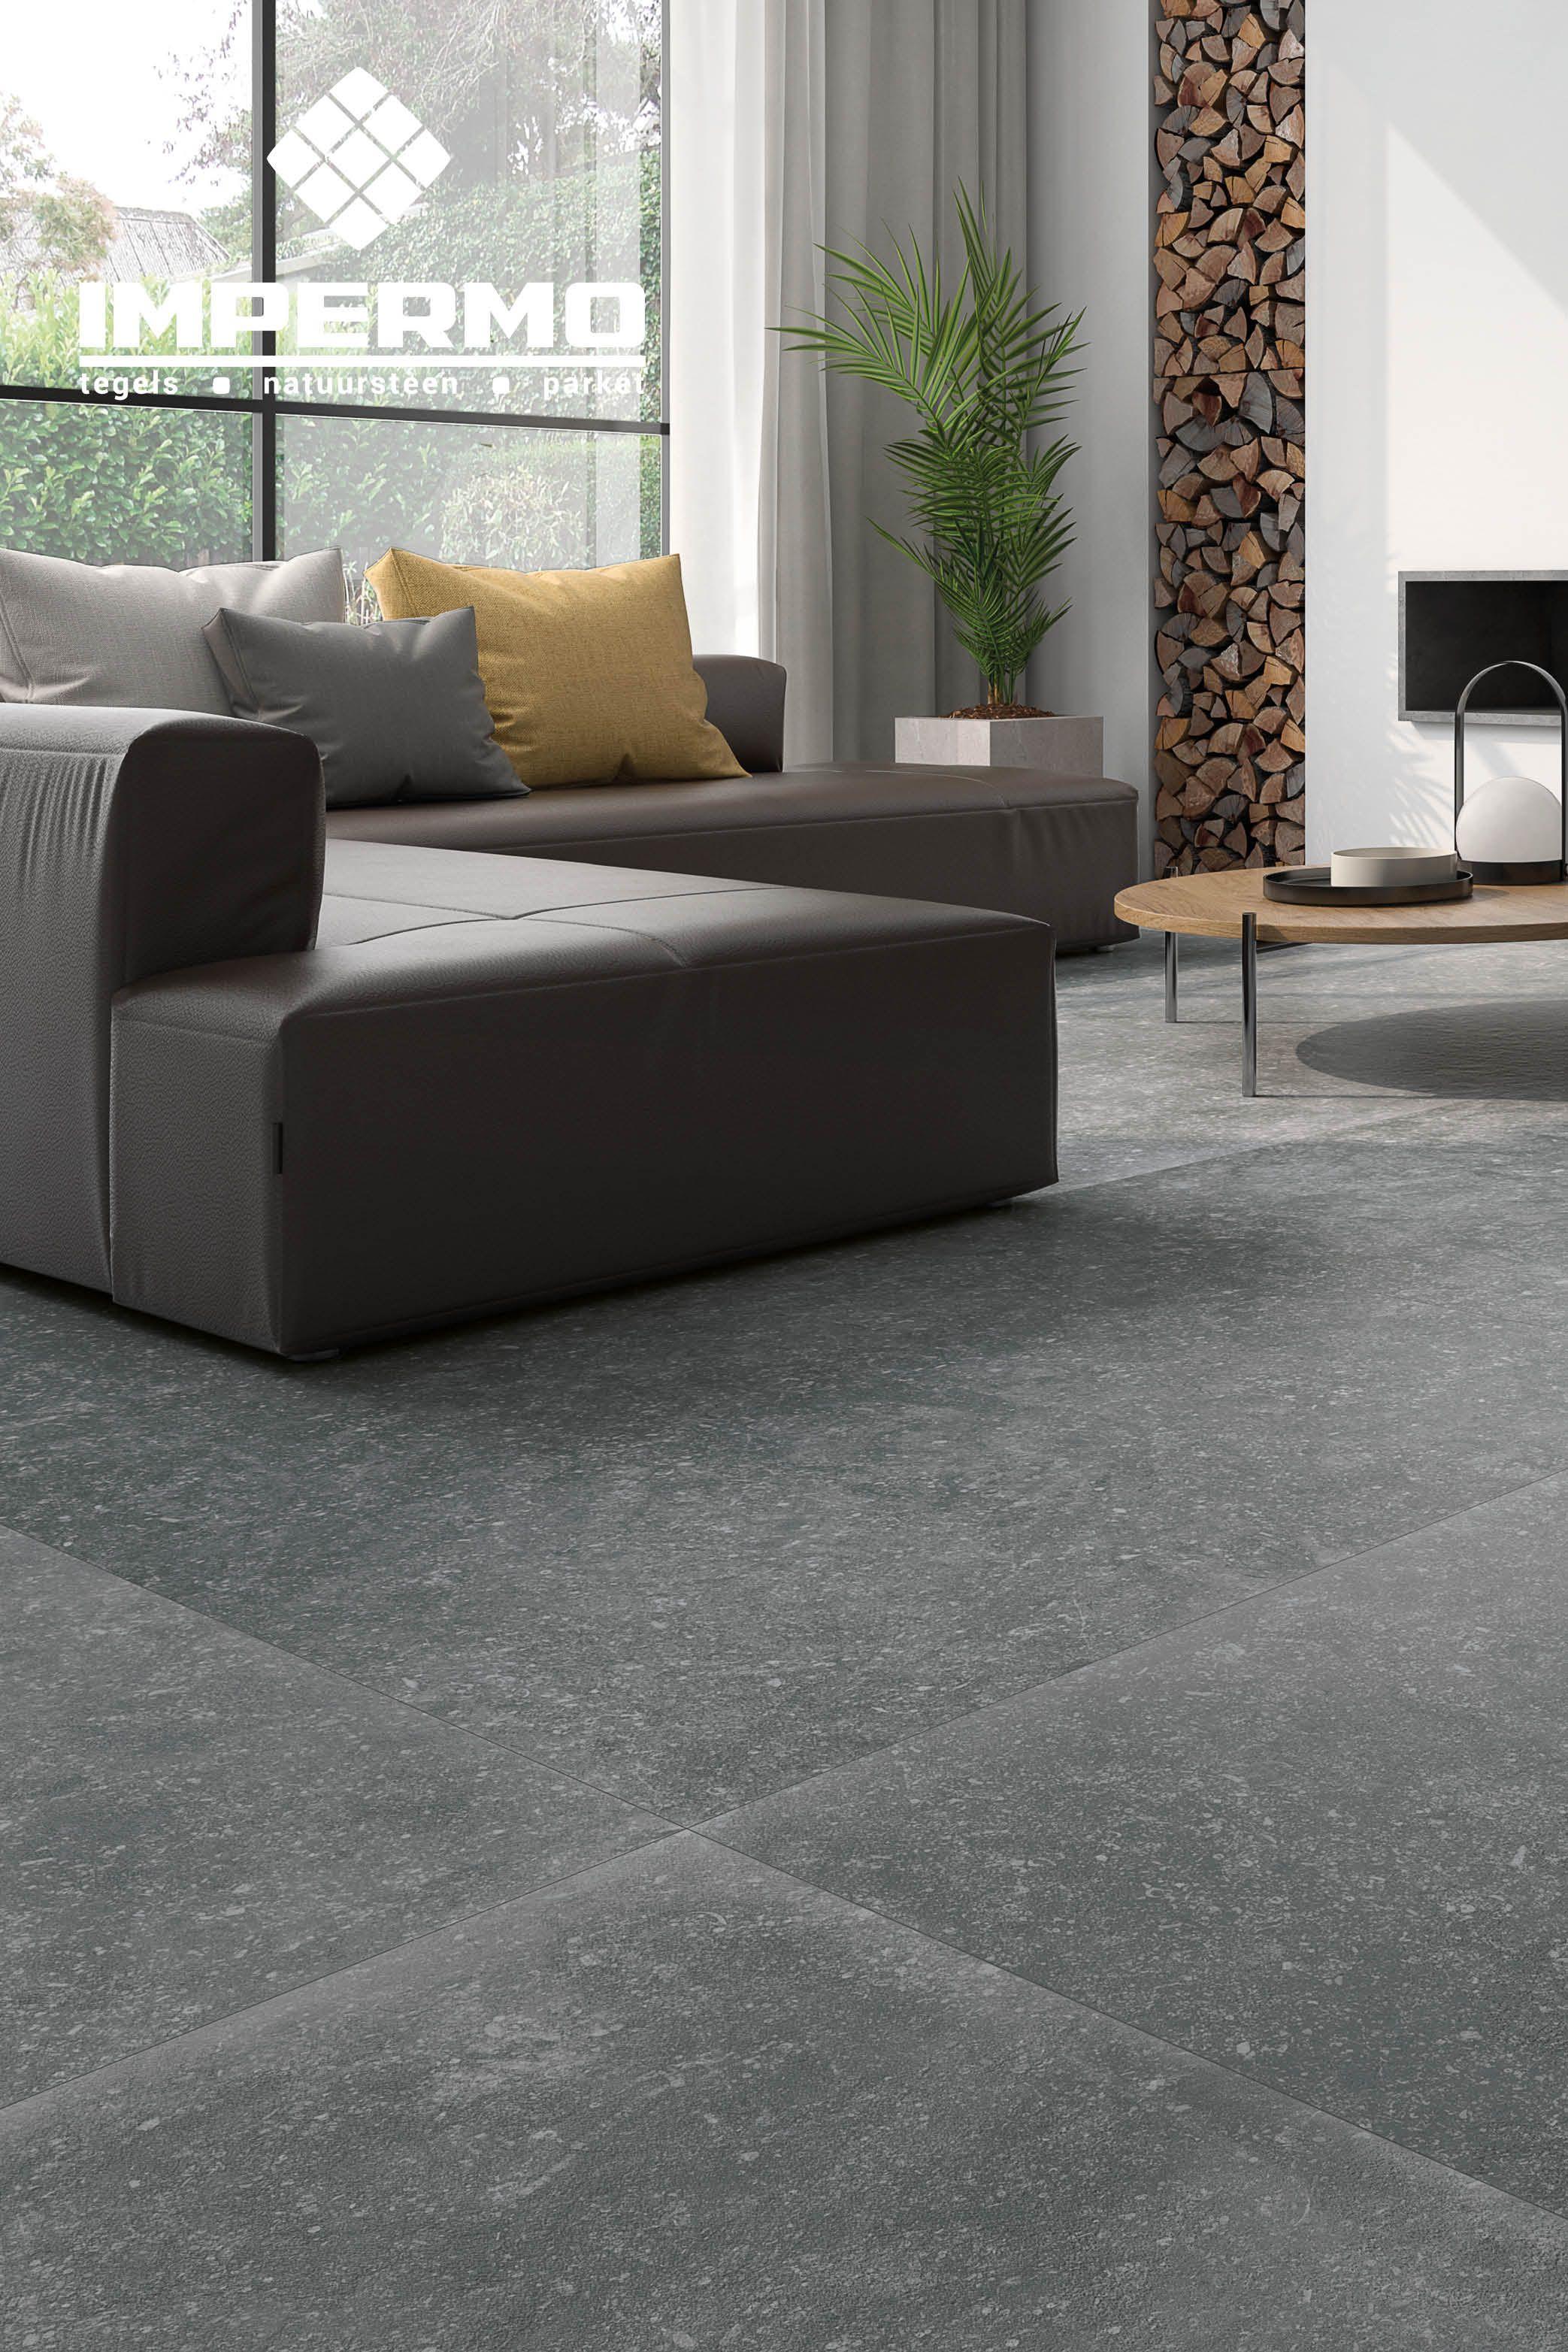 Materia Grigio | vloer | Pinterest | Showroom